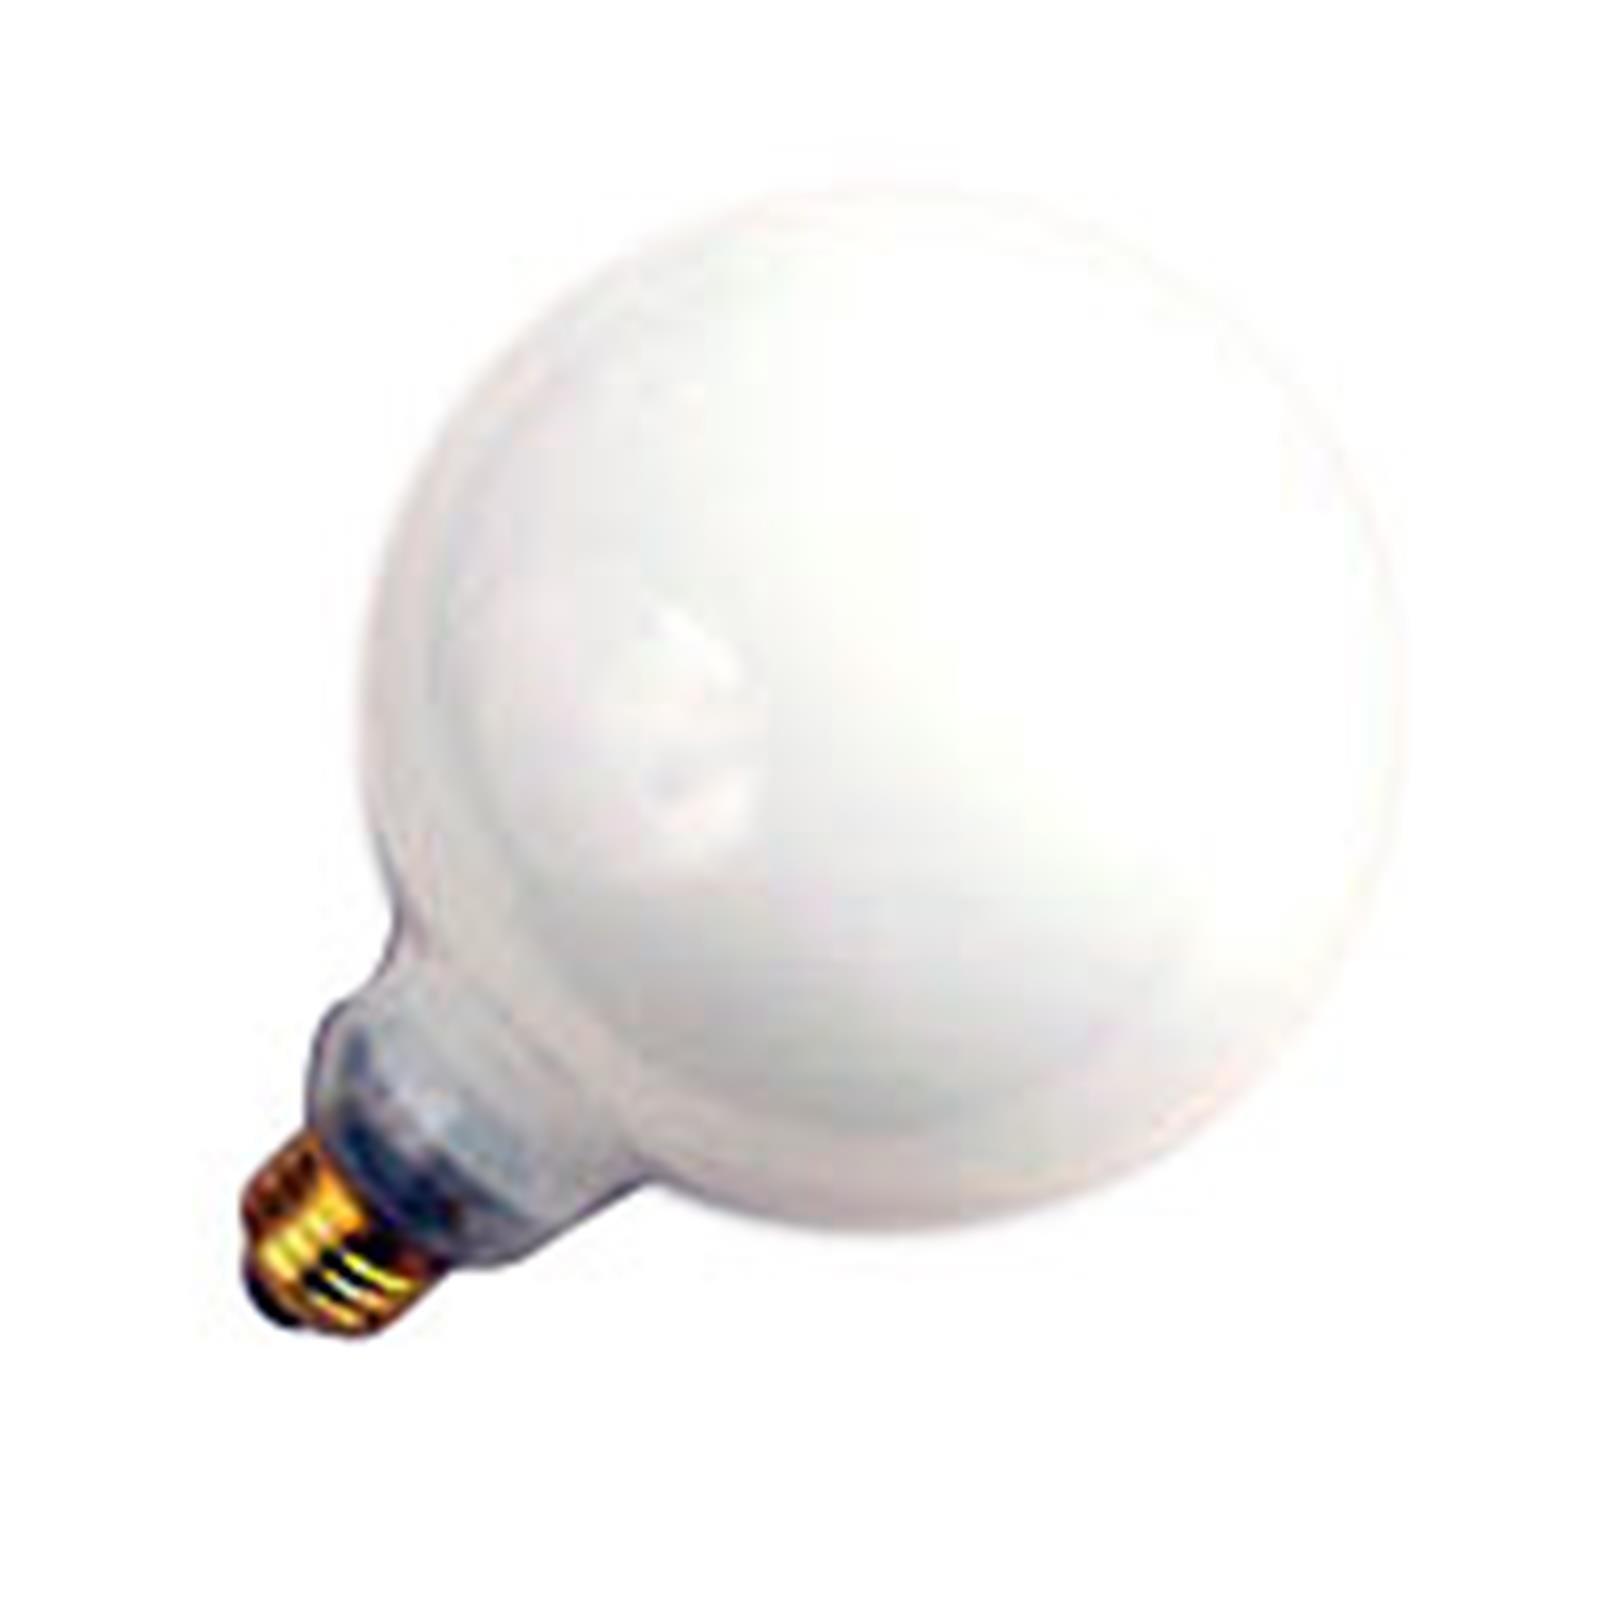 6 Qty. Halco 60W G40 WH Med 130V Halco G40WH60 60w 130v Incandescent White Lamp Bulb